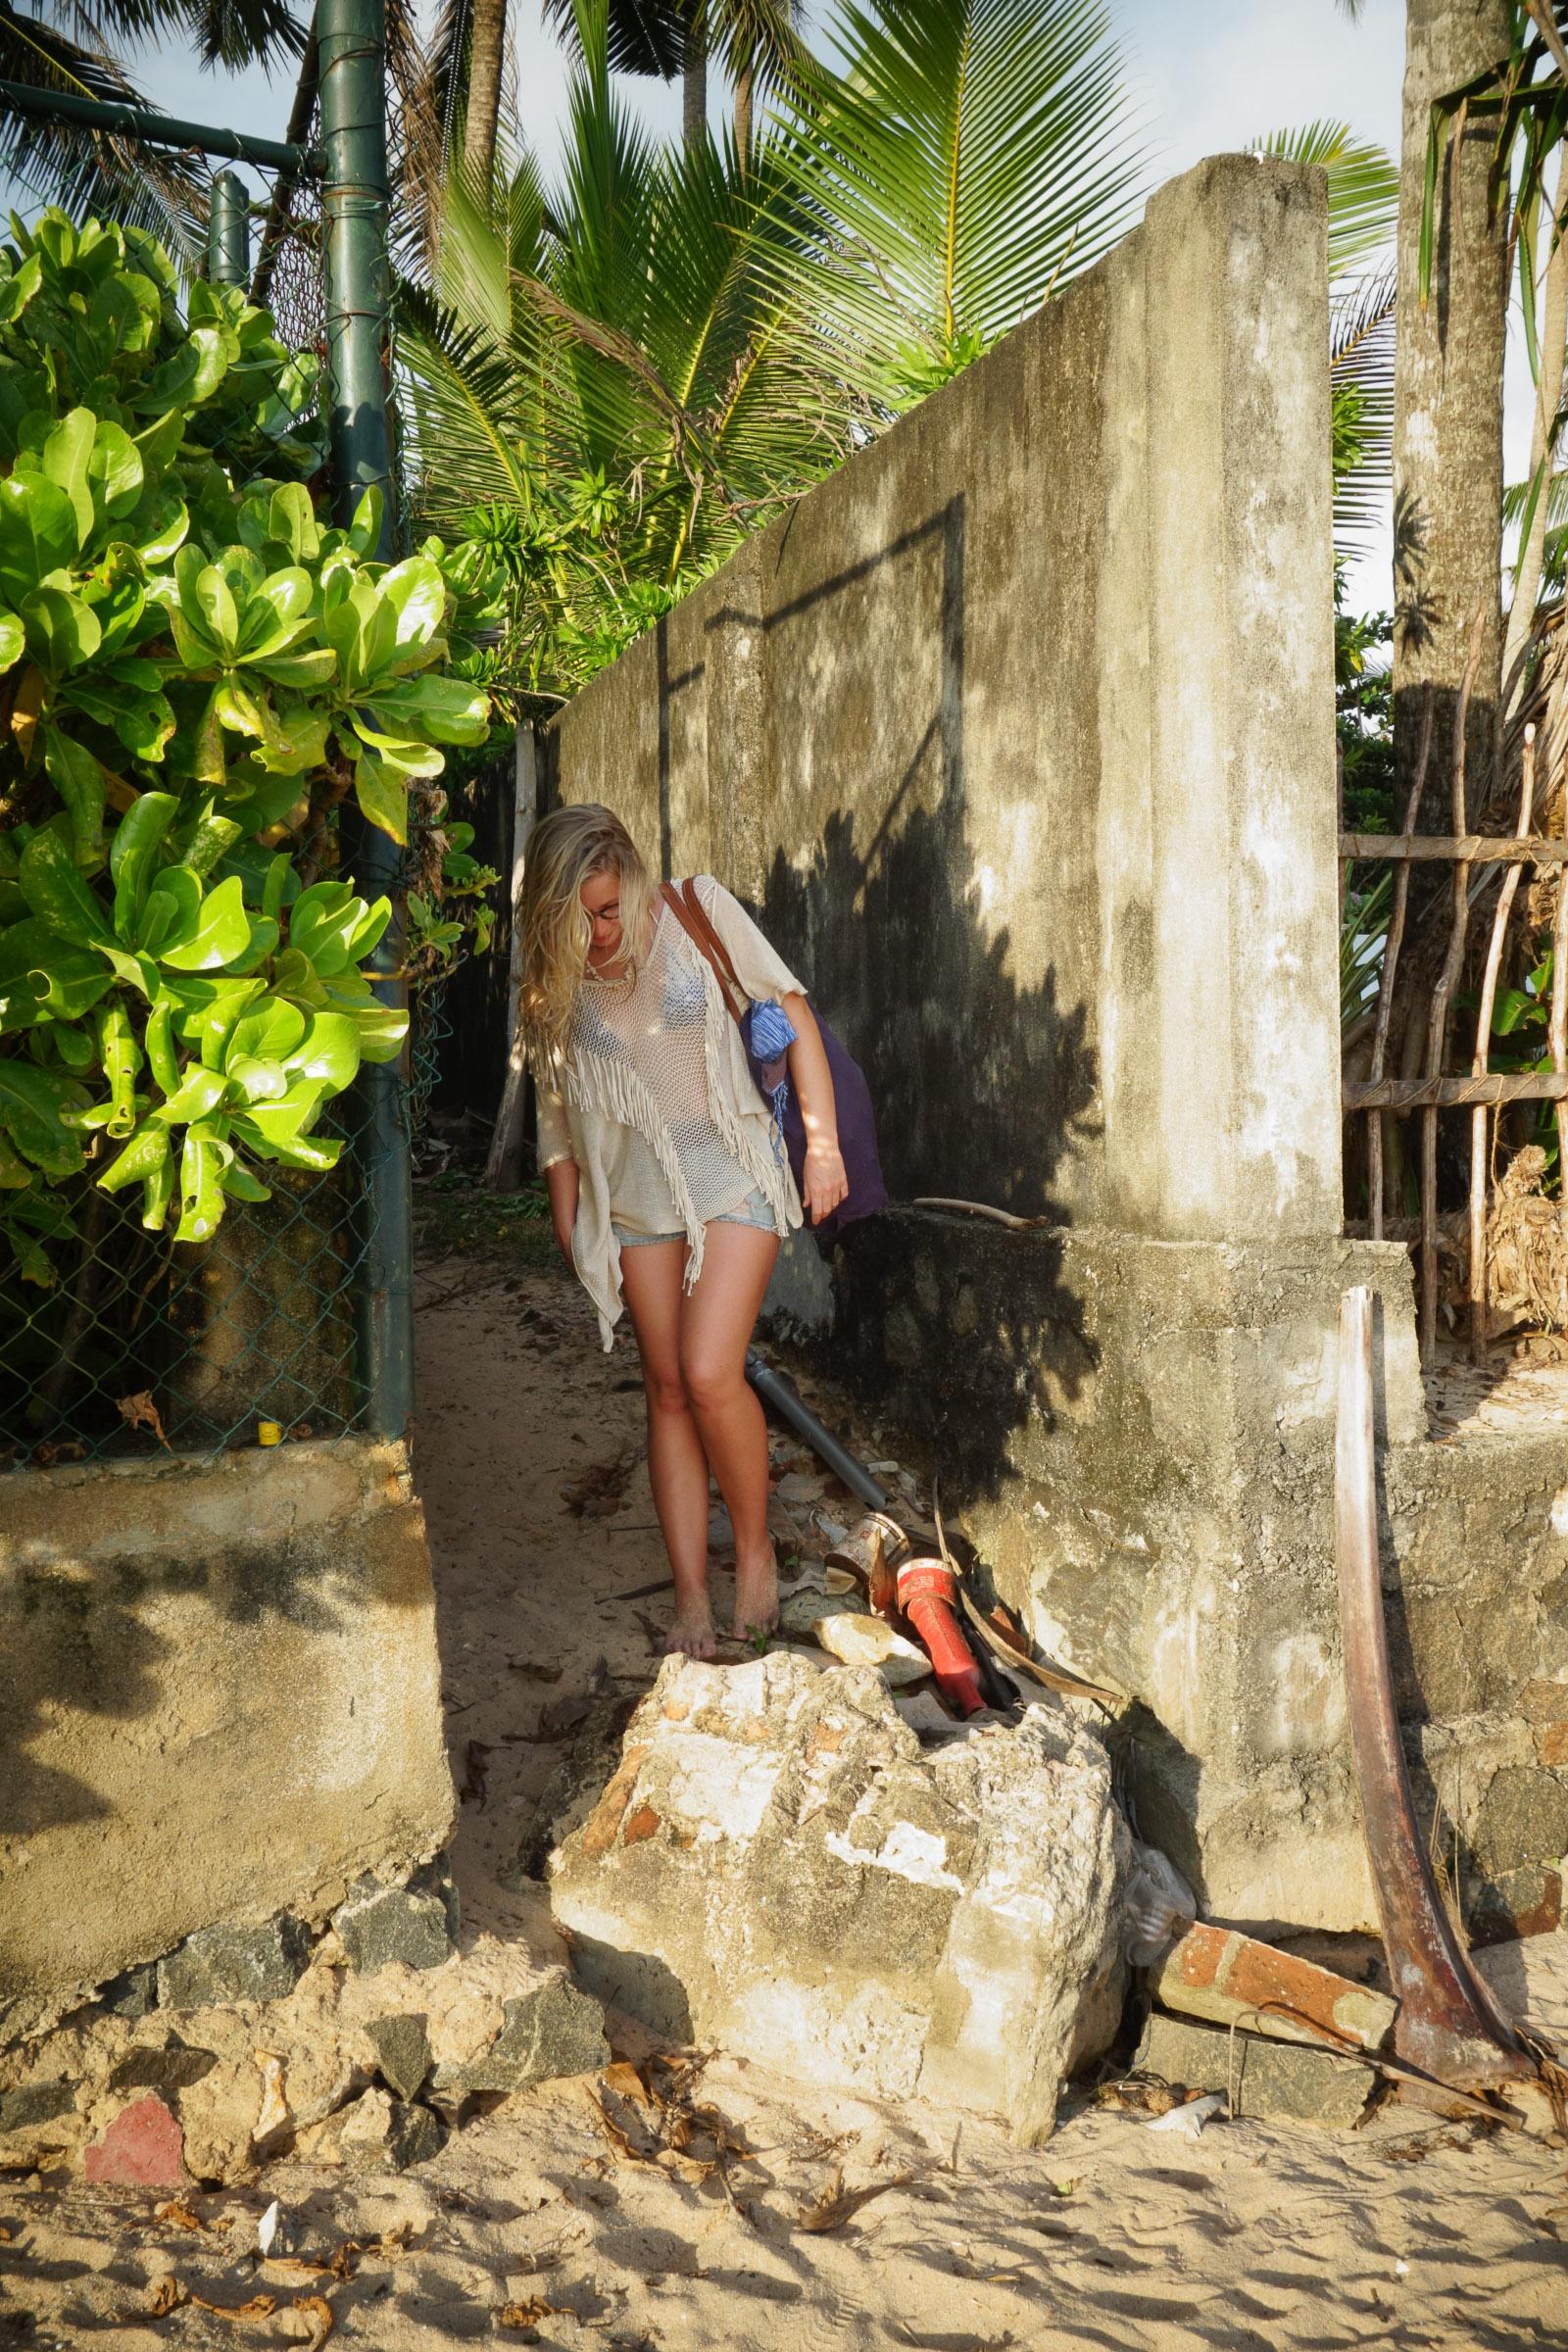 Sunshinestories-surf-travel-blog-DSC03362